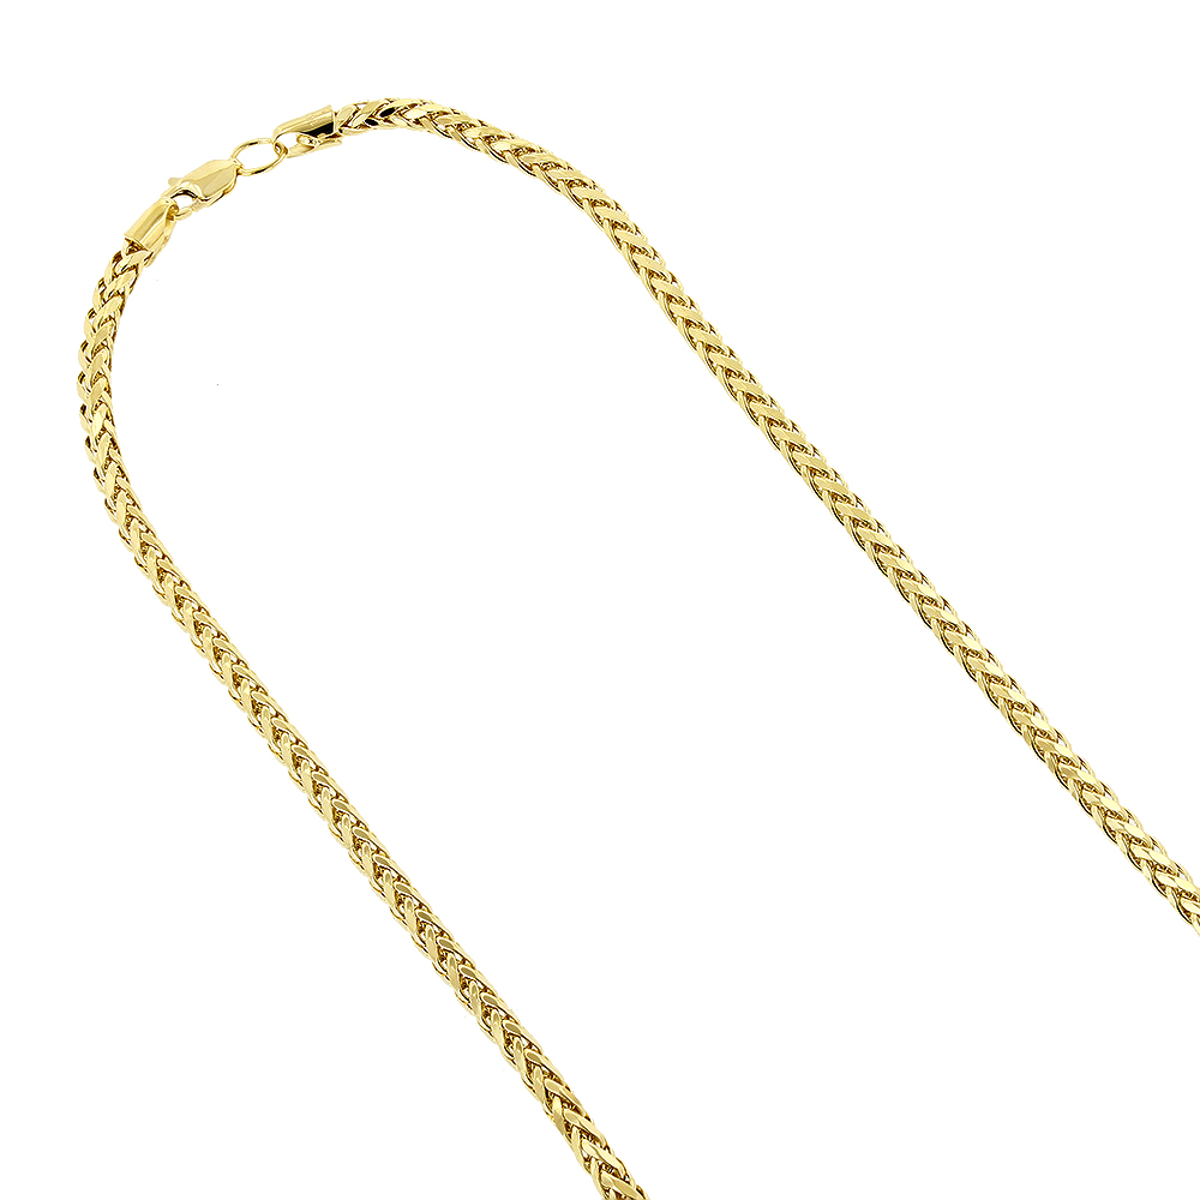 Hollow 14k Gold Franco Chain For Men & Women Round Diamond Cut 2.7mm